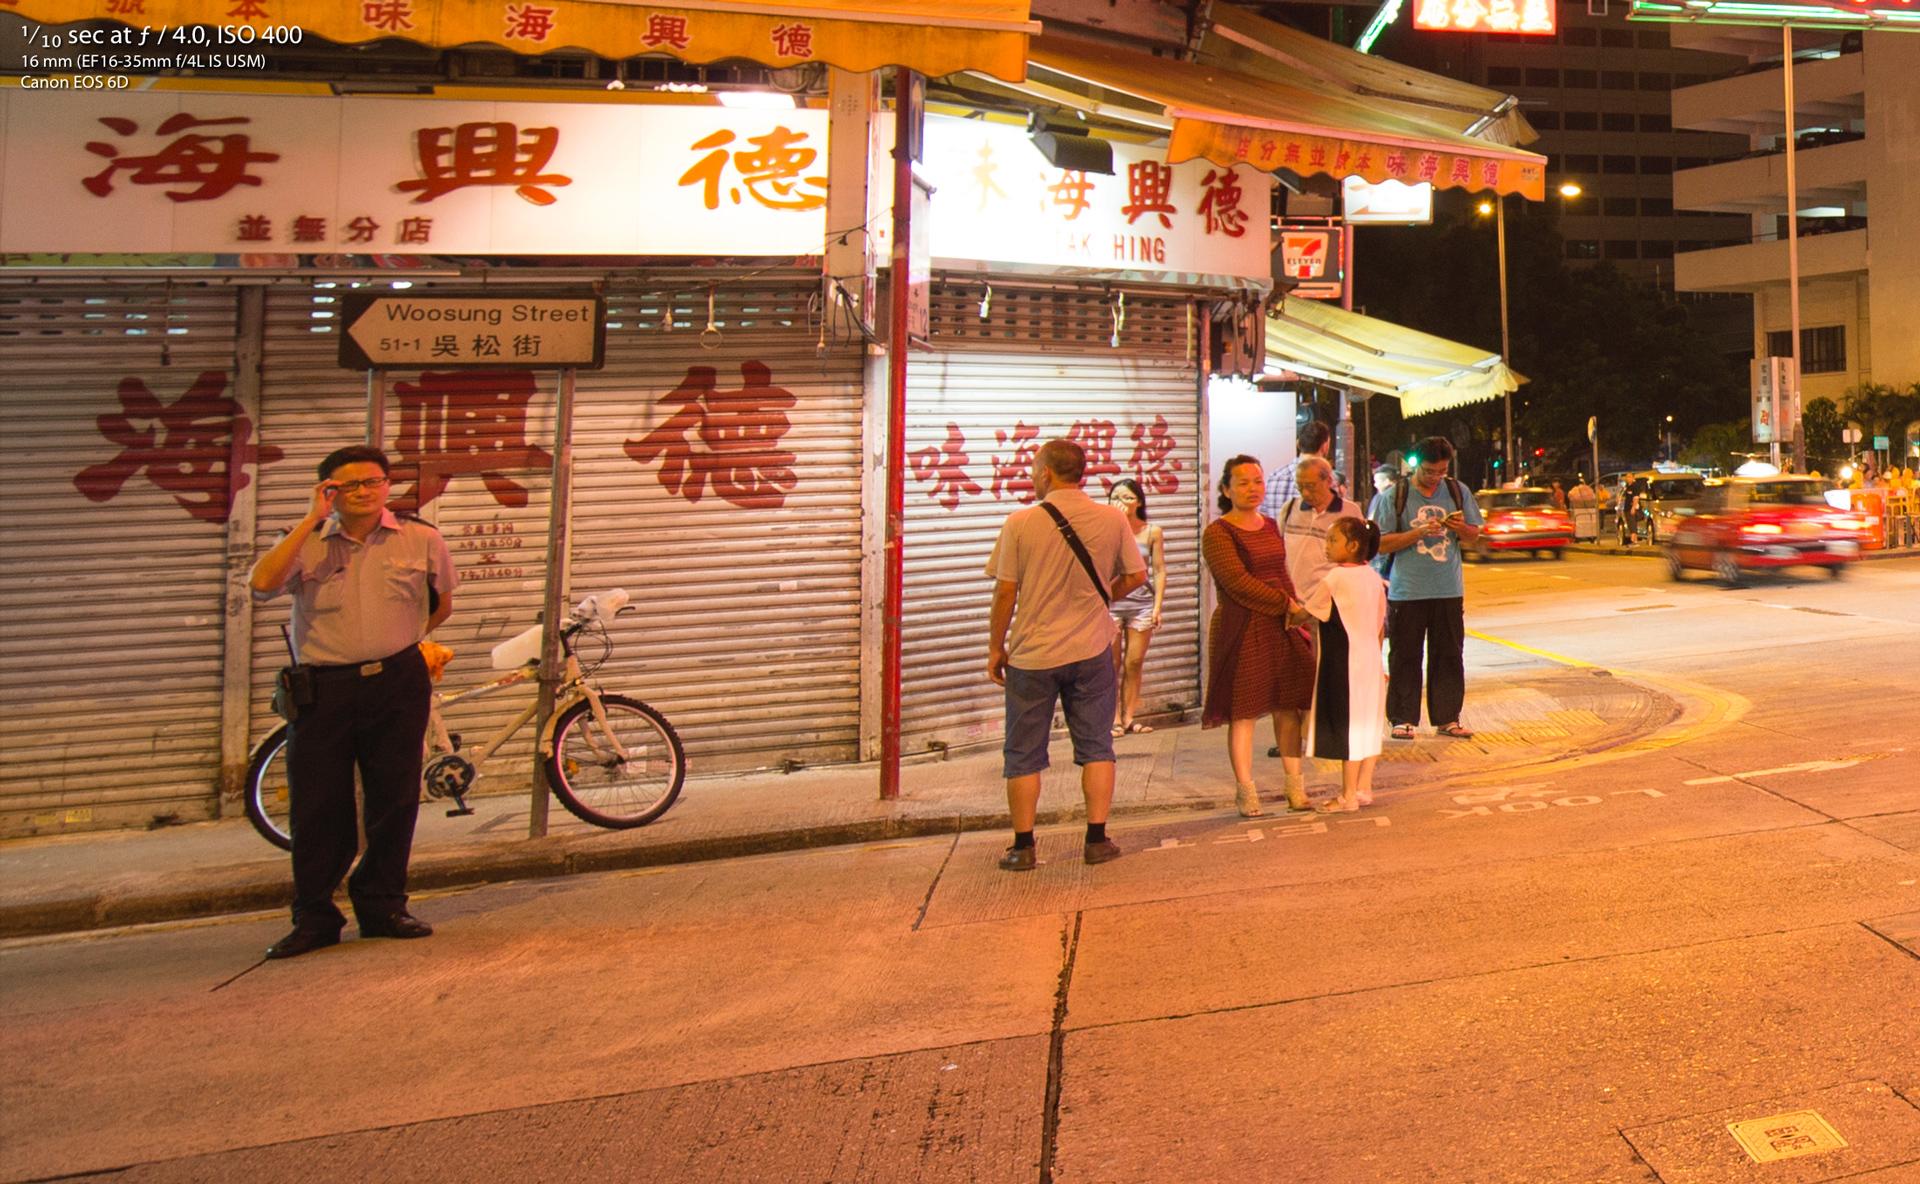 Canon 16-35mm F4 IS Review Hong Kong at Night 1